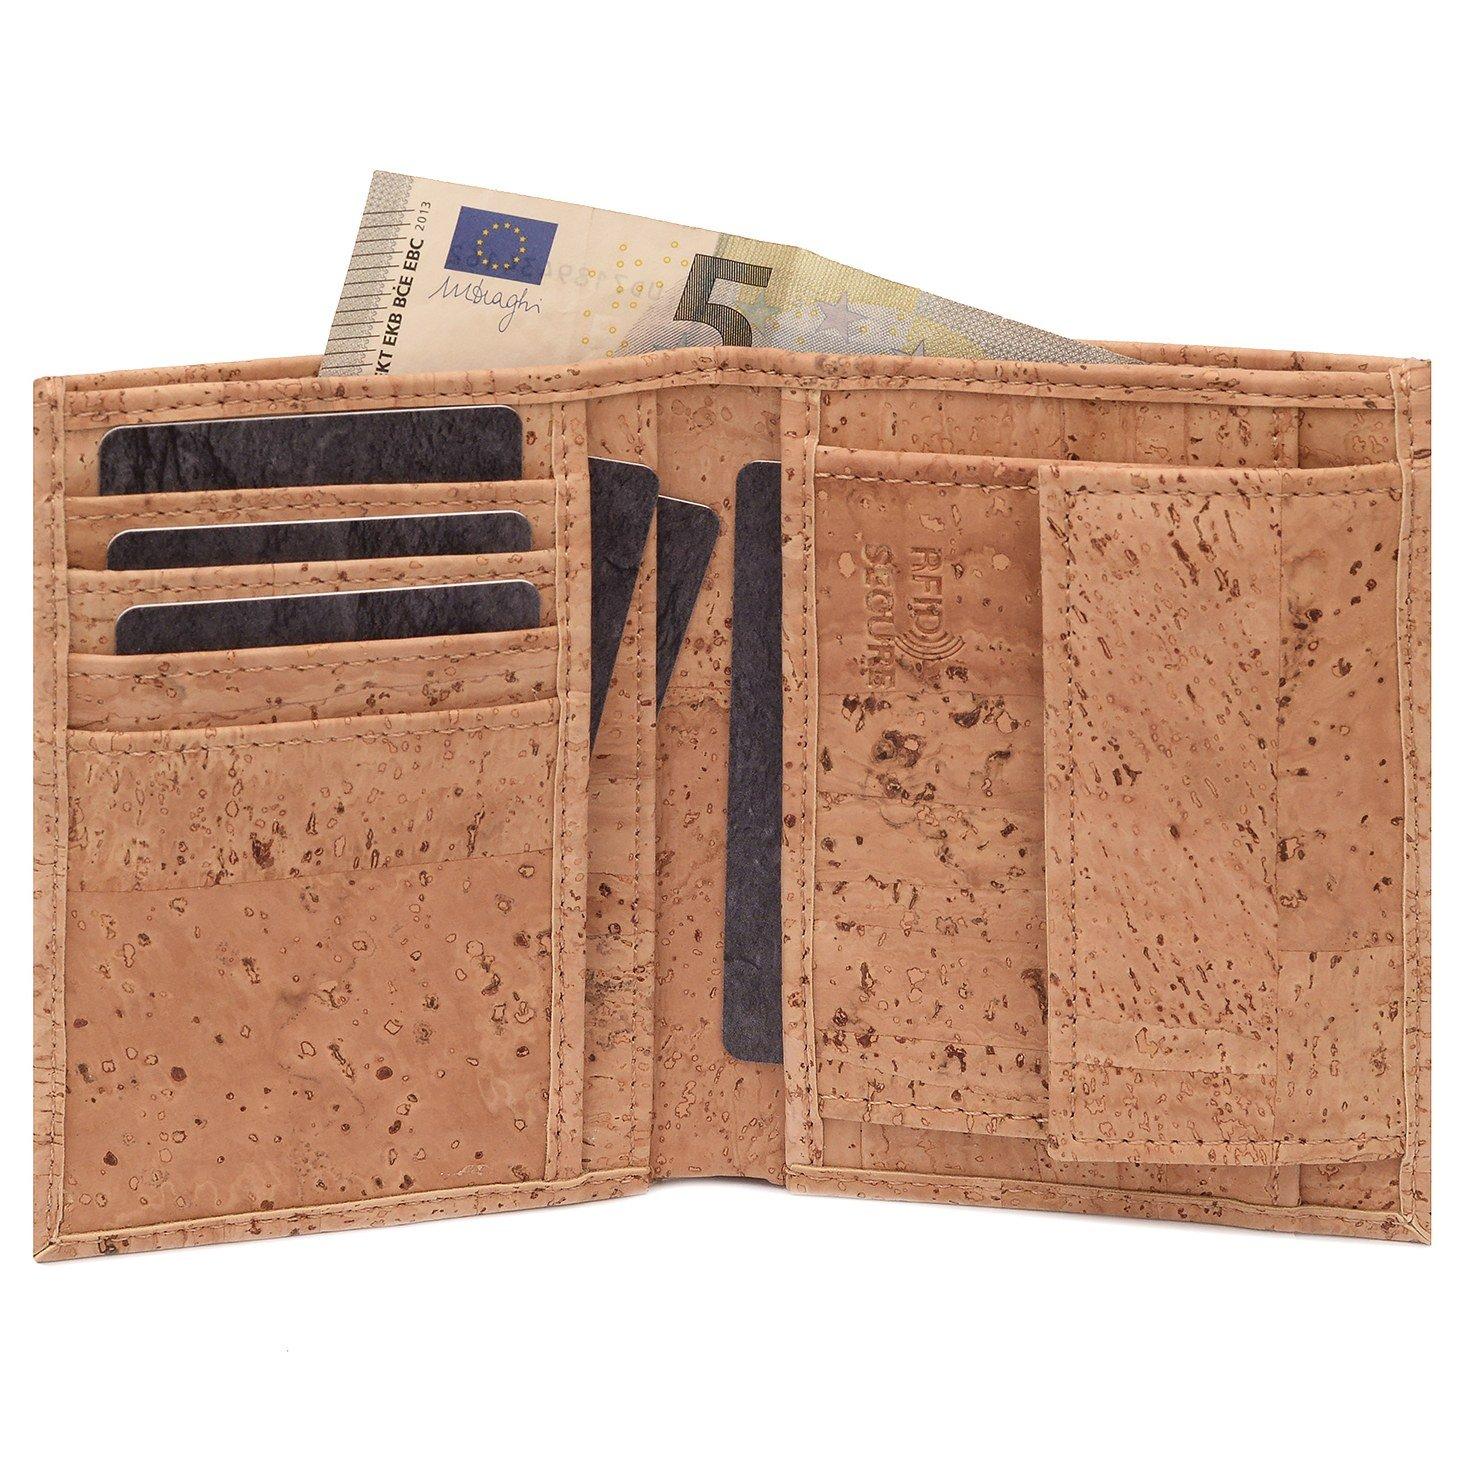 SIMARU-KAZUHIKO-RFID-BLOCK-Kork-Portemonnaie